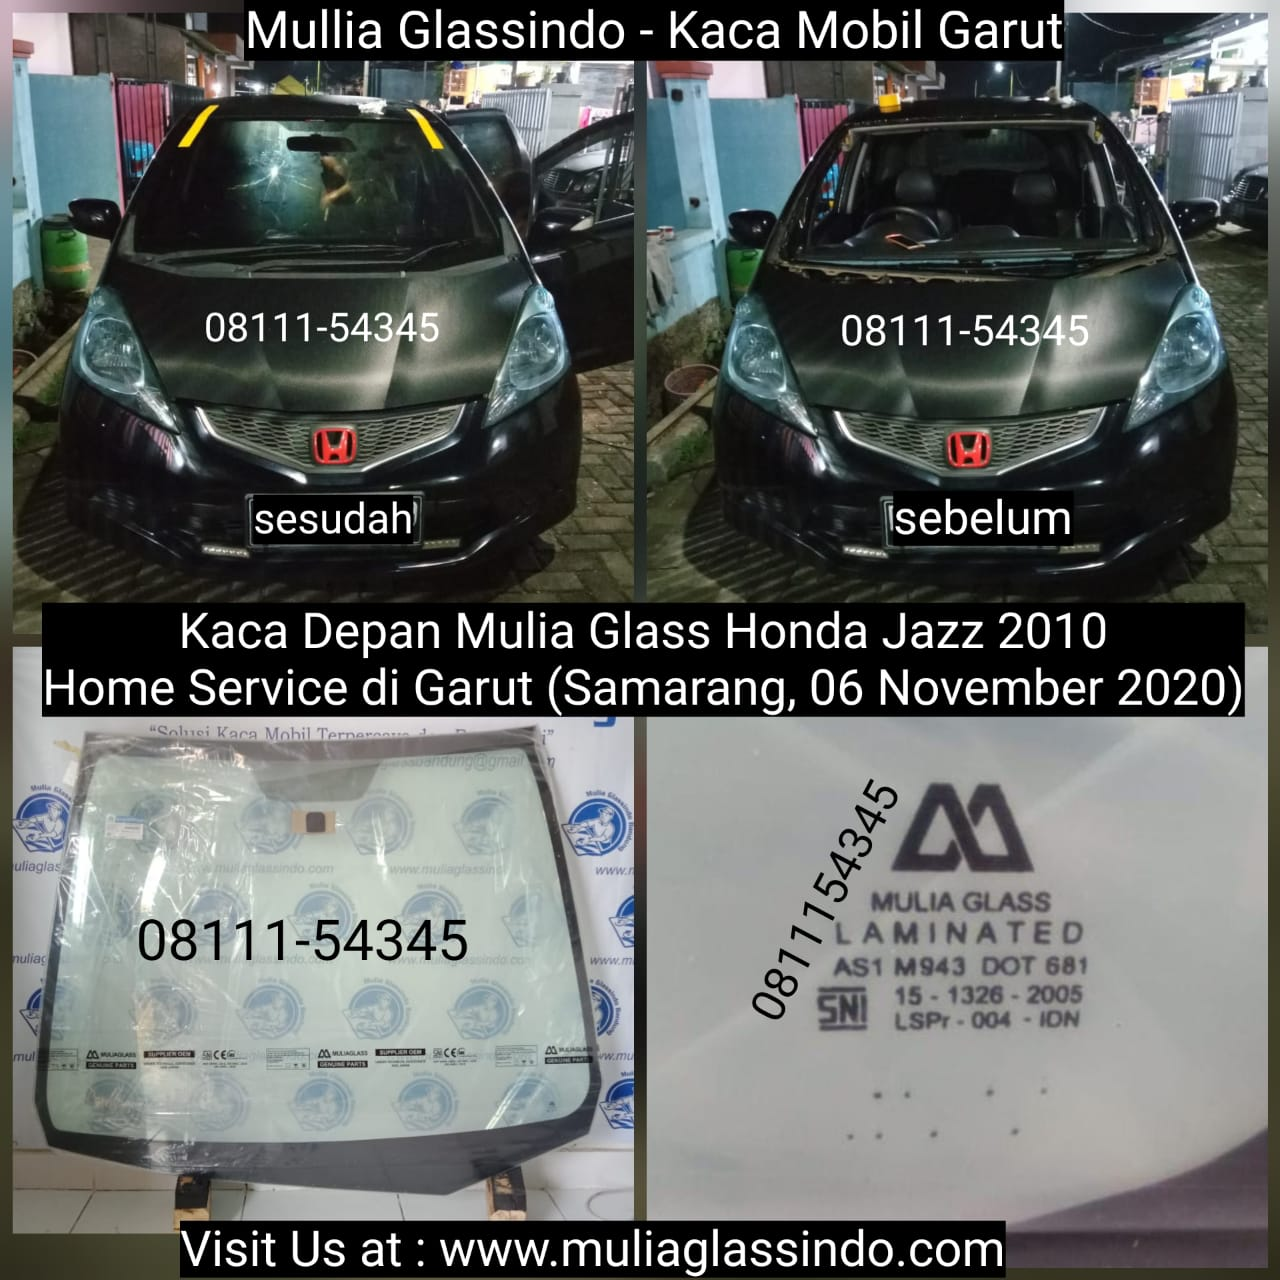 Home Service Pemasangan Kaca Mobil Honda Jazz di Garut (Samarang, 06 November 2020)